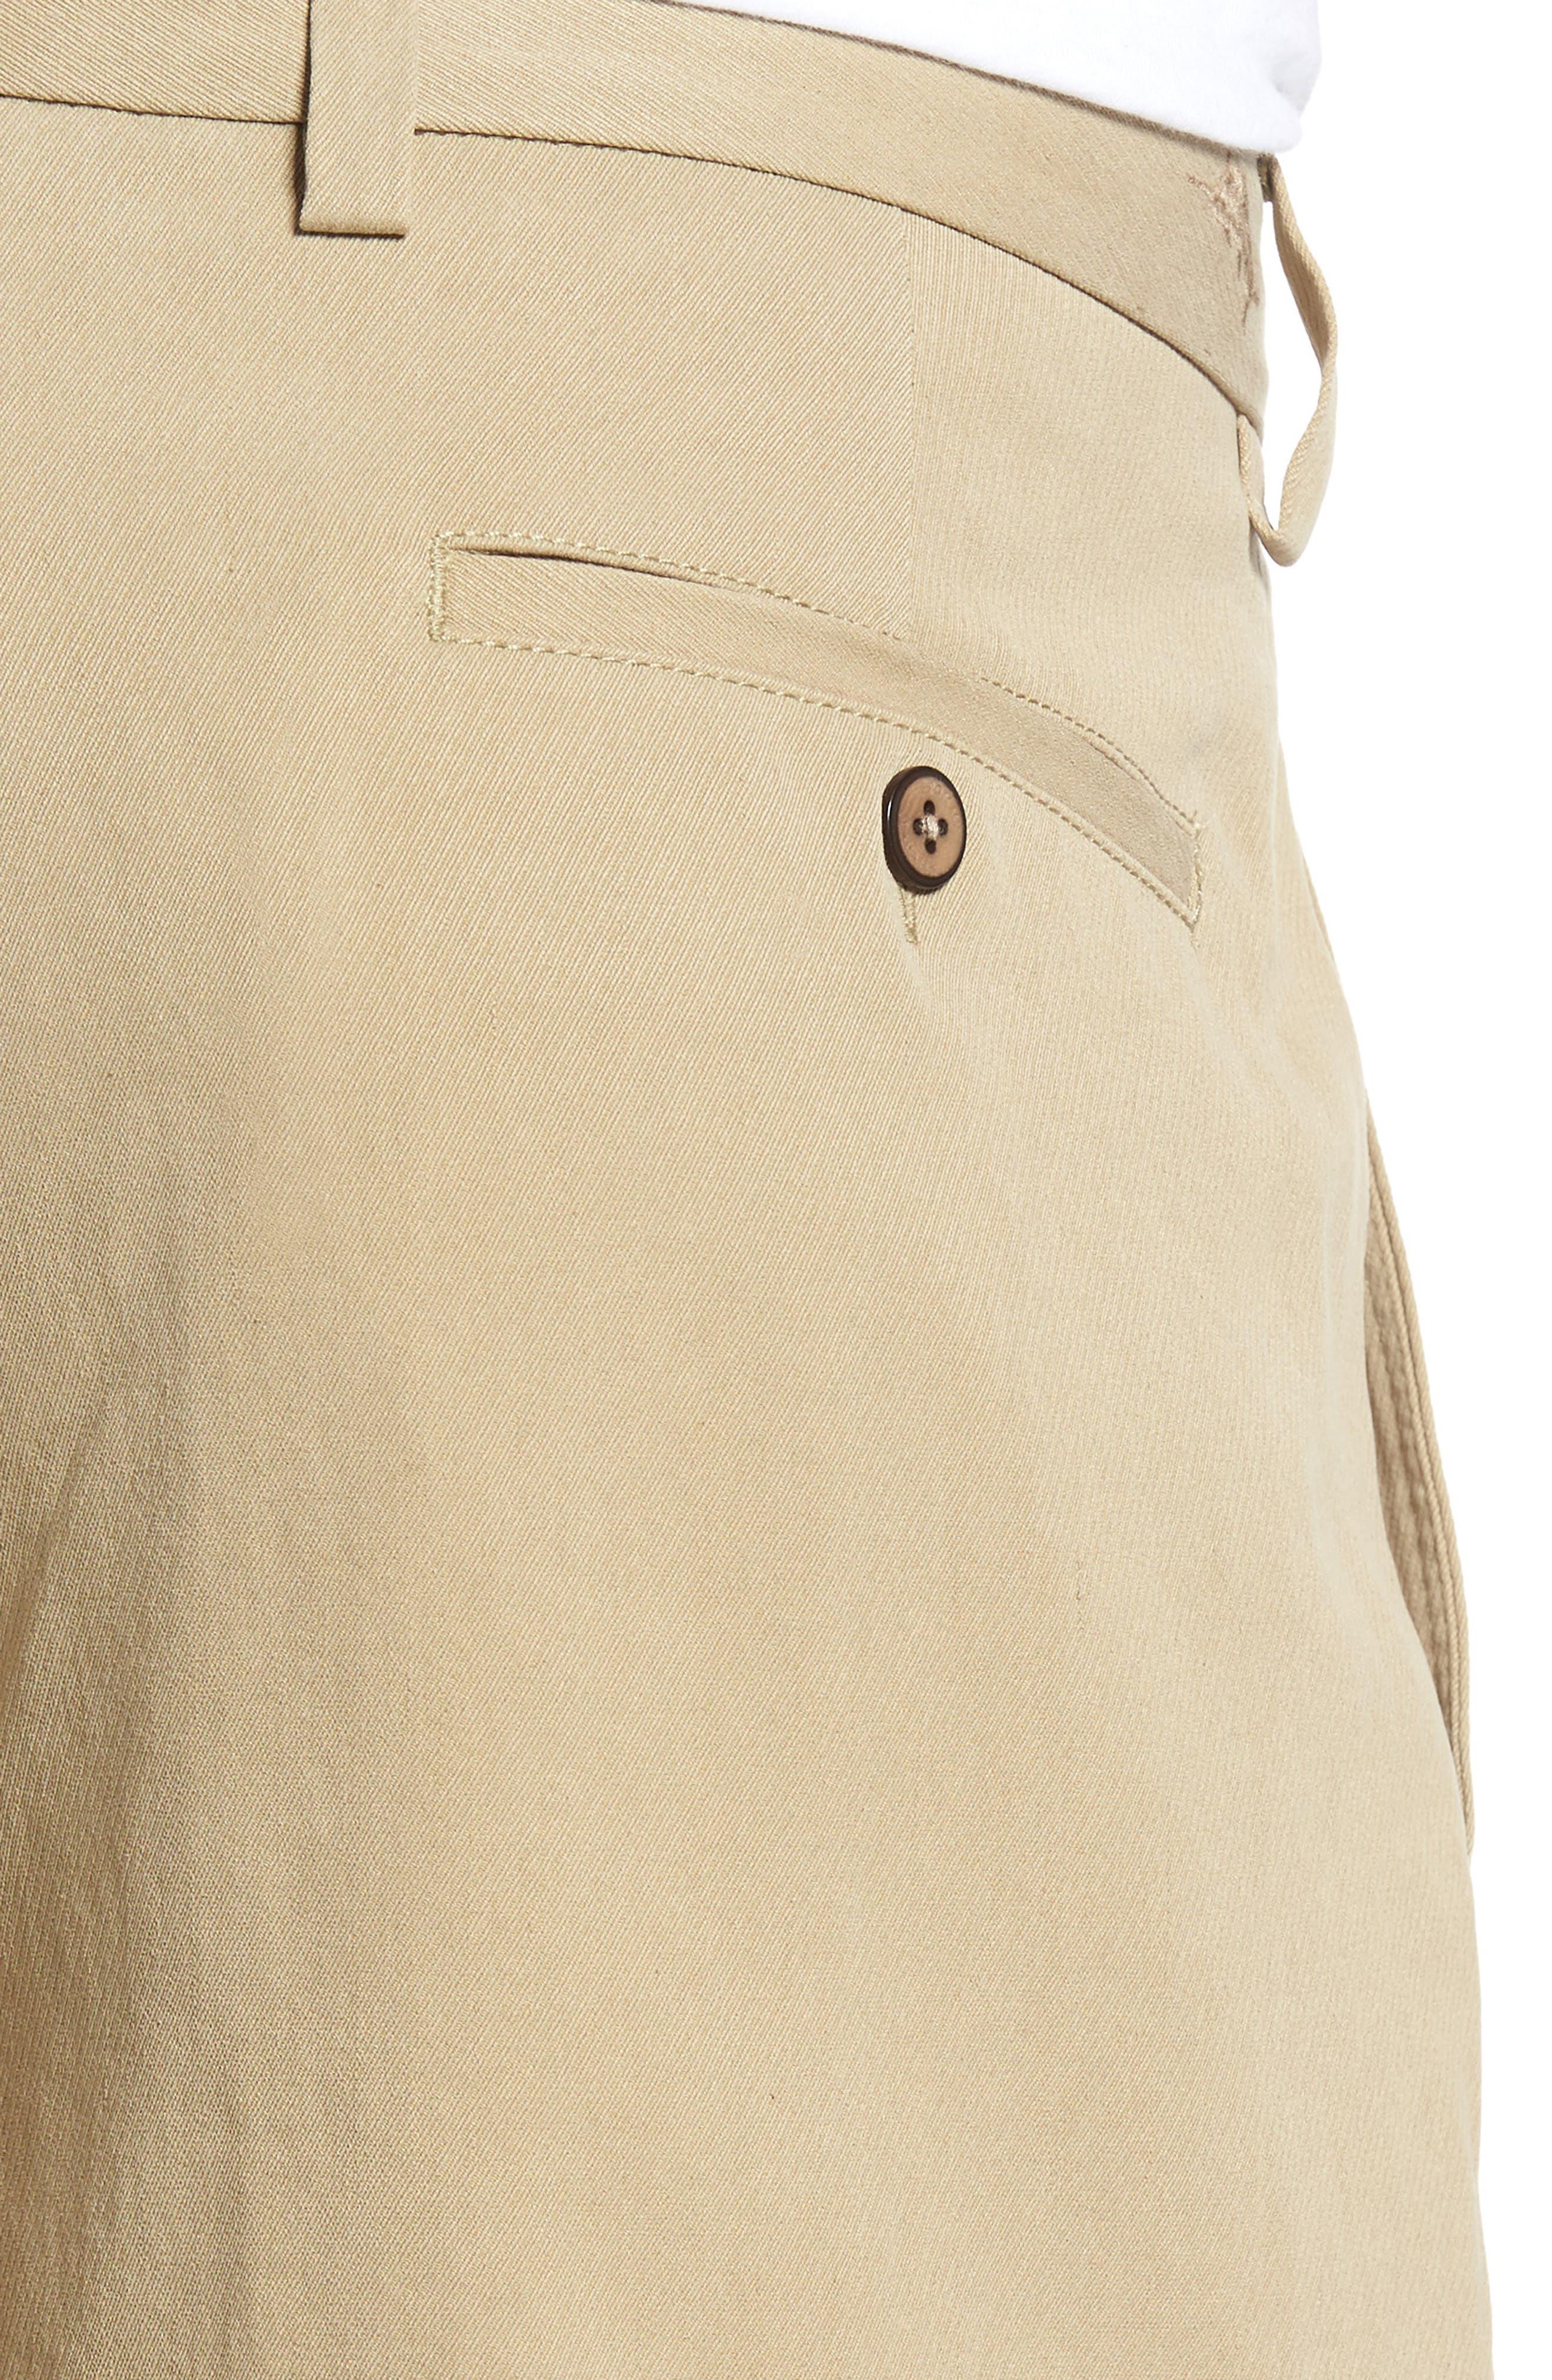 St. Thomas Pleated Shorts,                             Alternate thumbnail 21, color,